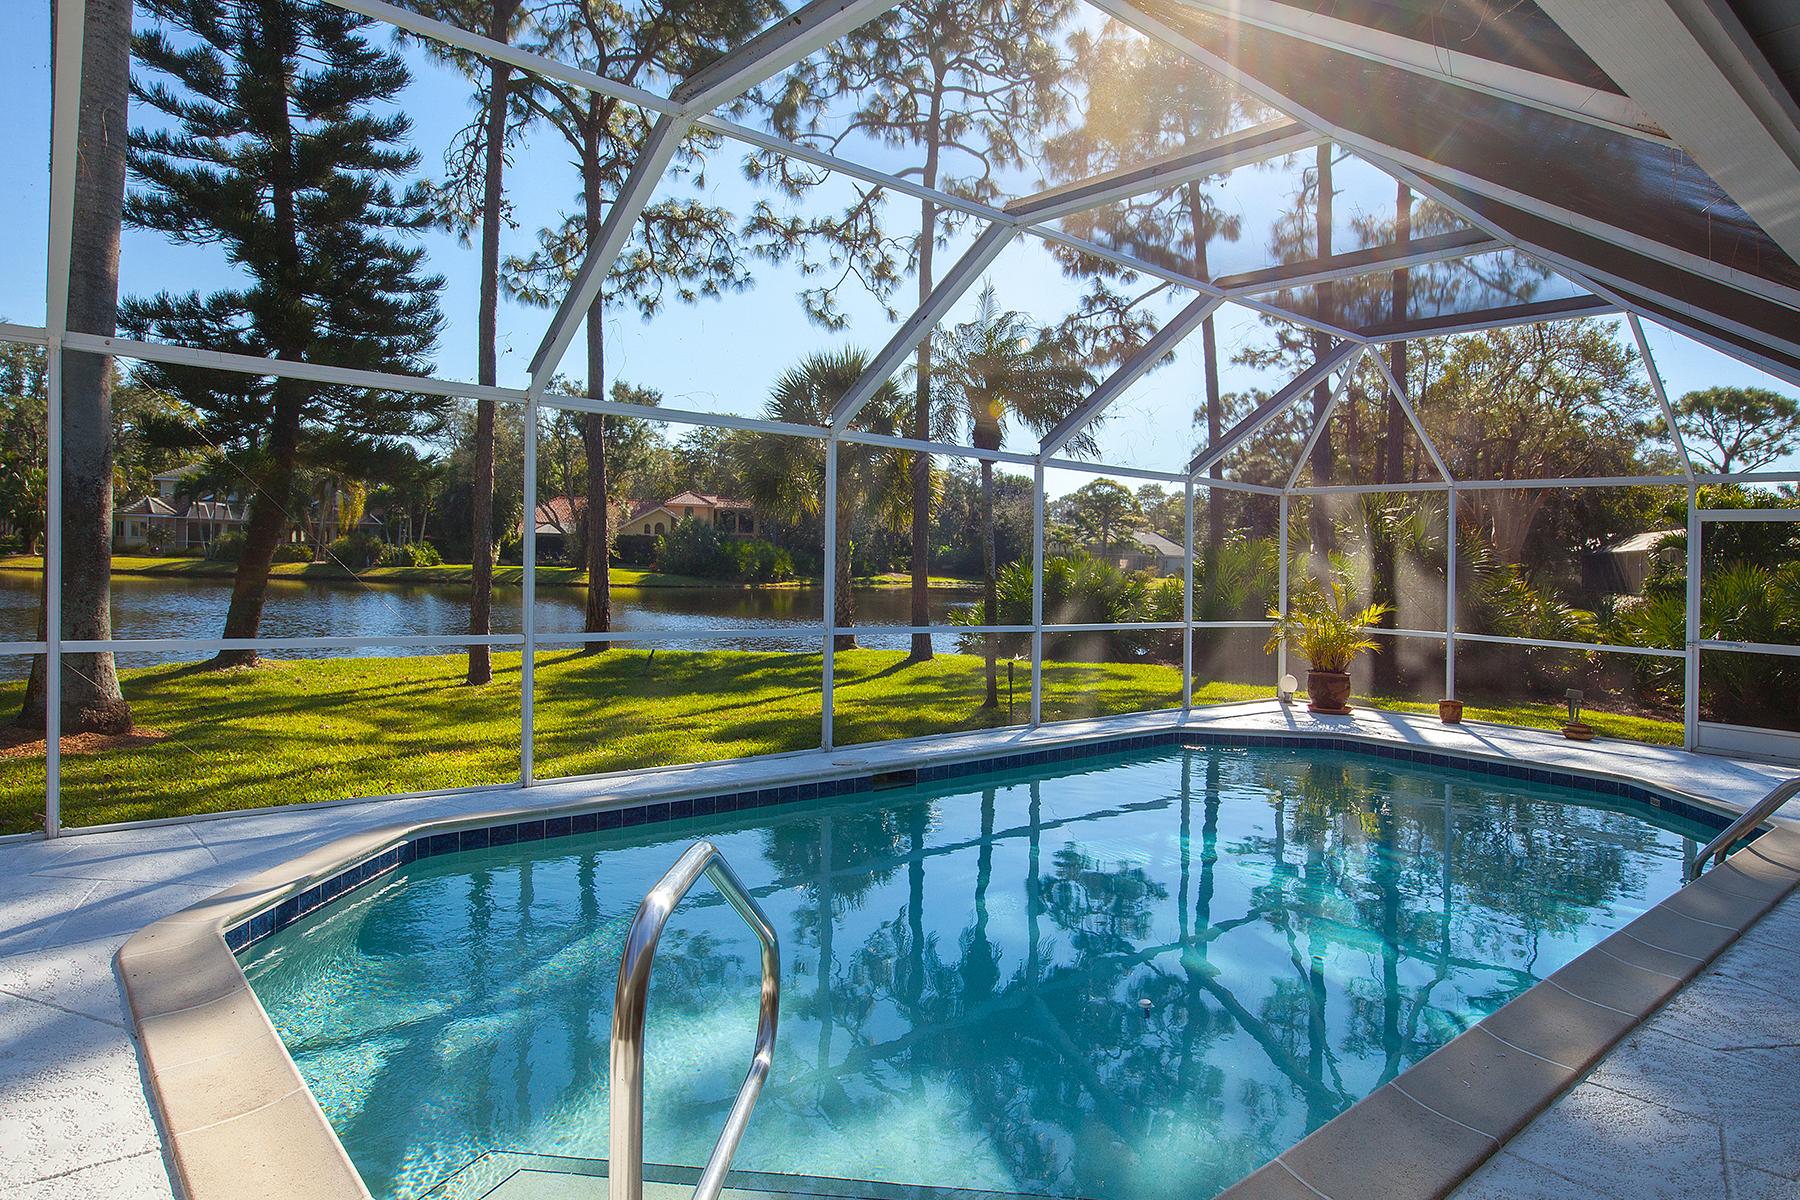 Maison unifamiliale pour l Vente à WOODLAKE AT BONITA BAY 3866 Woodlake Dr Bonita Springs, Florida, 34134 États-Unis